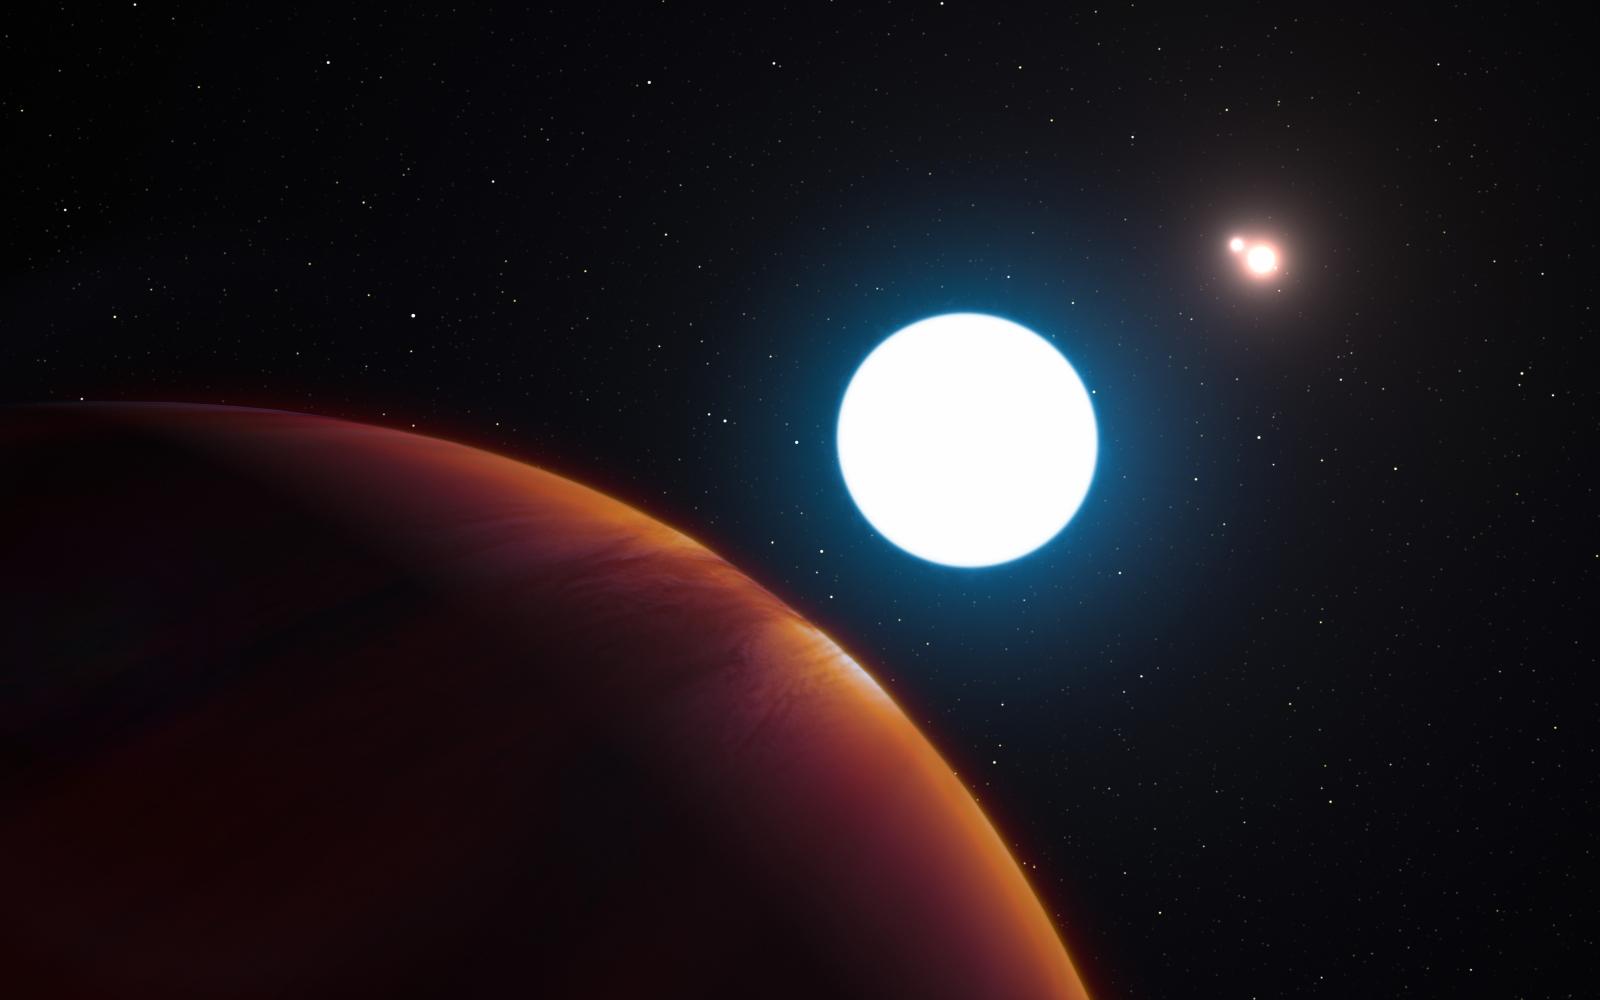 giant planet three stars